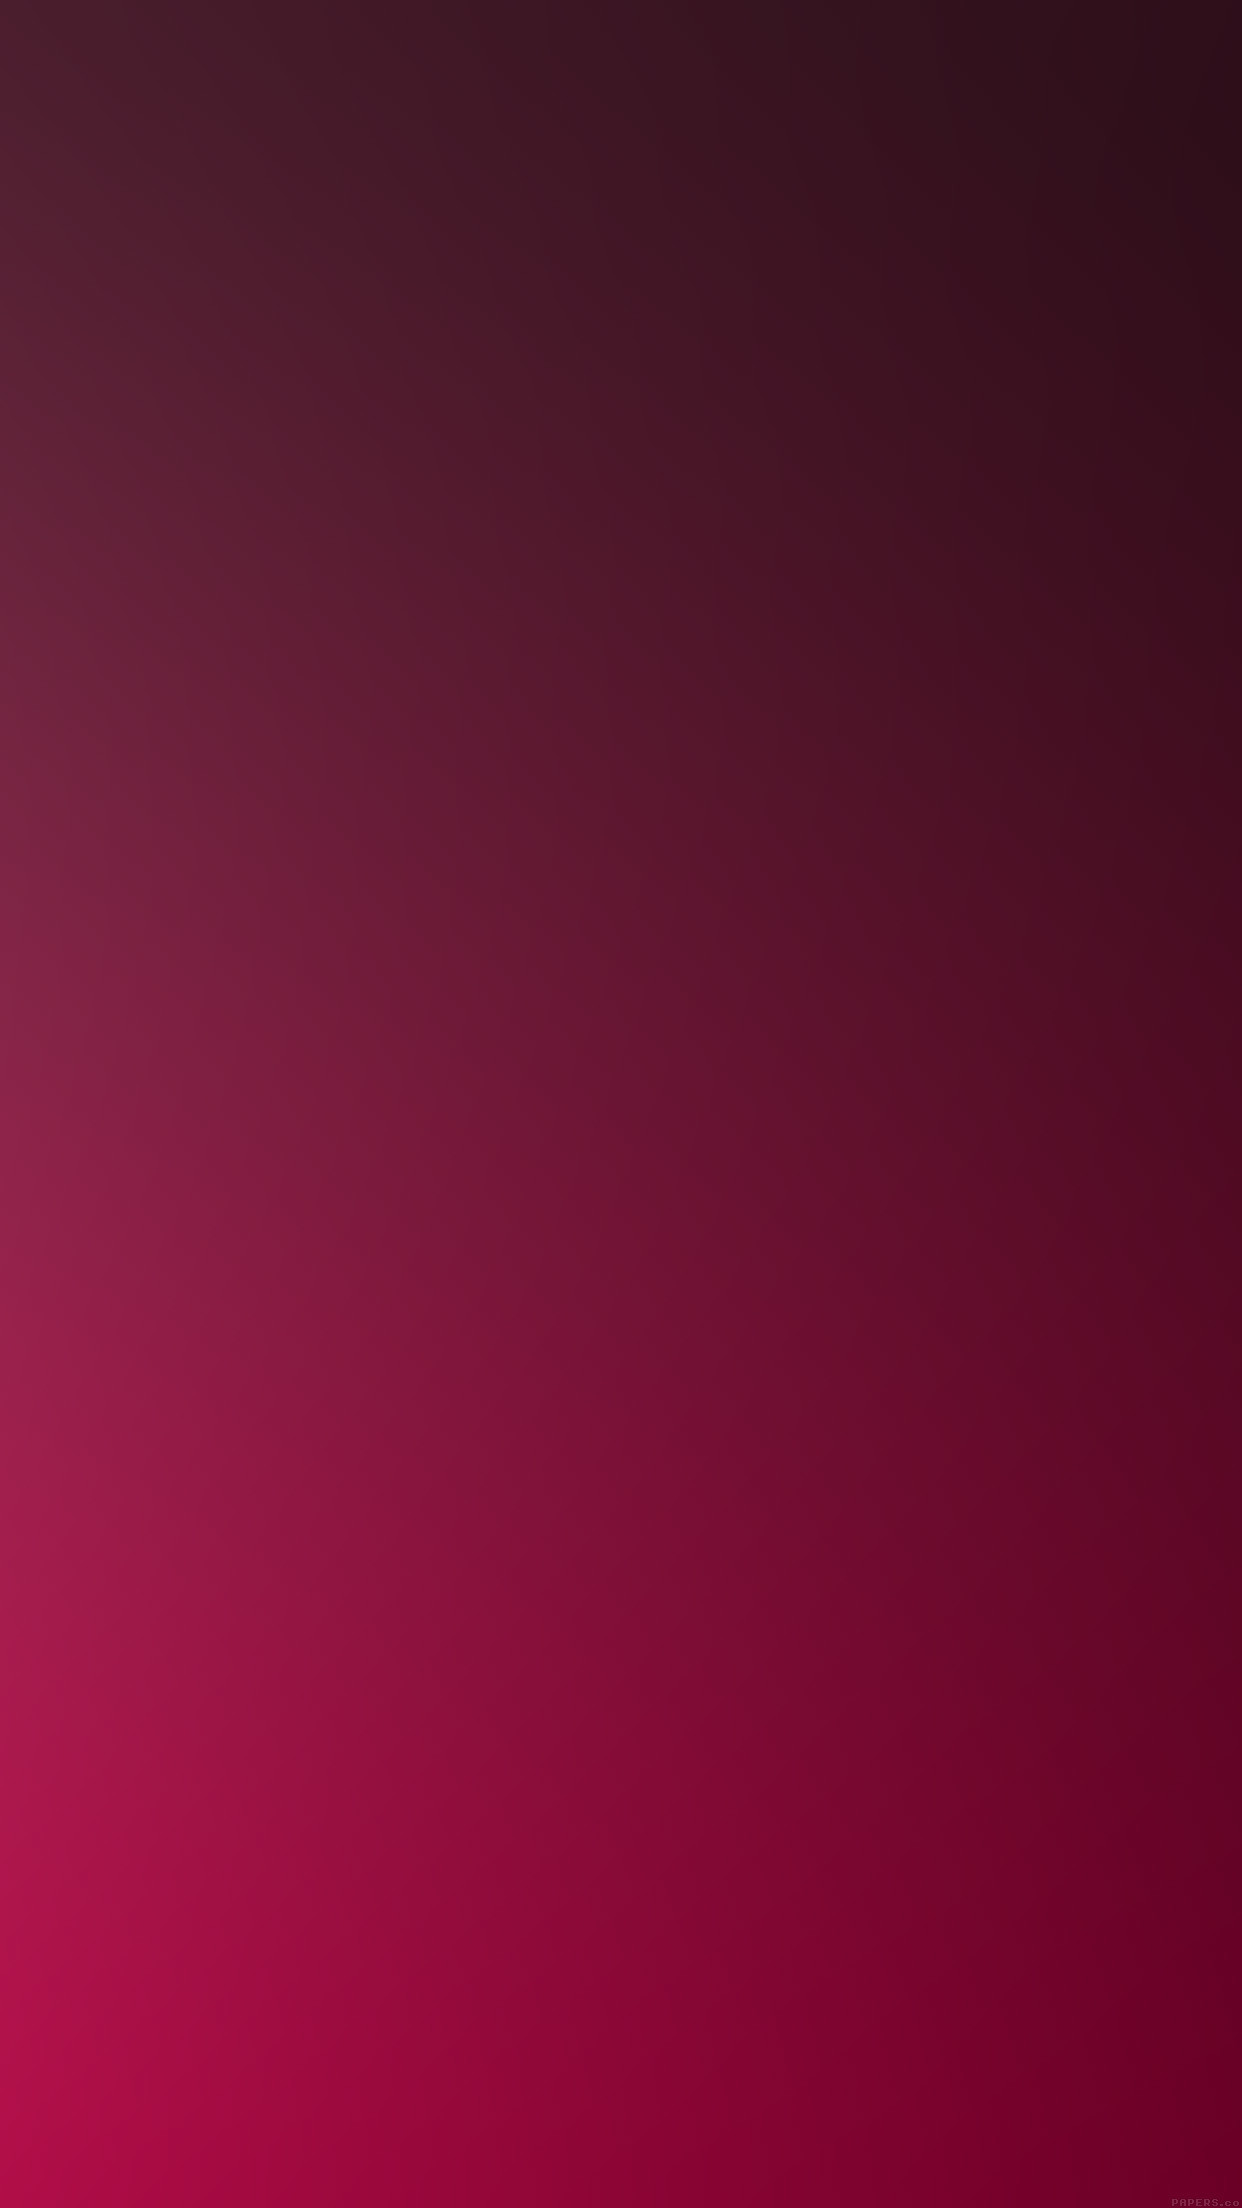 Plus Red Wallpaper Apple iPhone 6 – Bing images